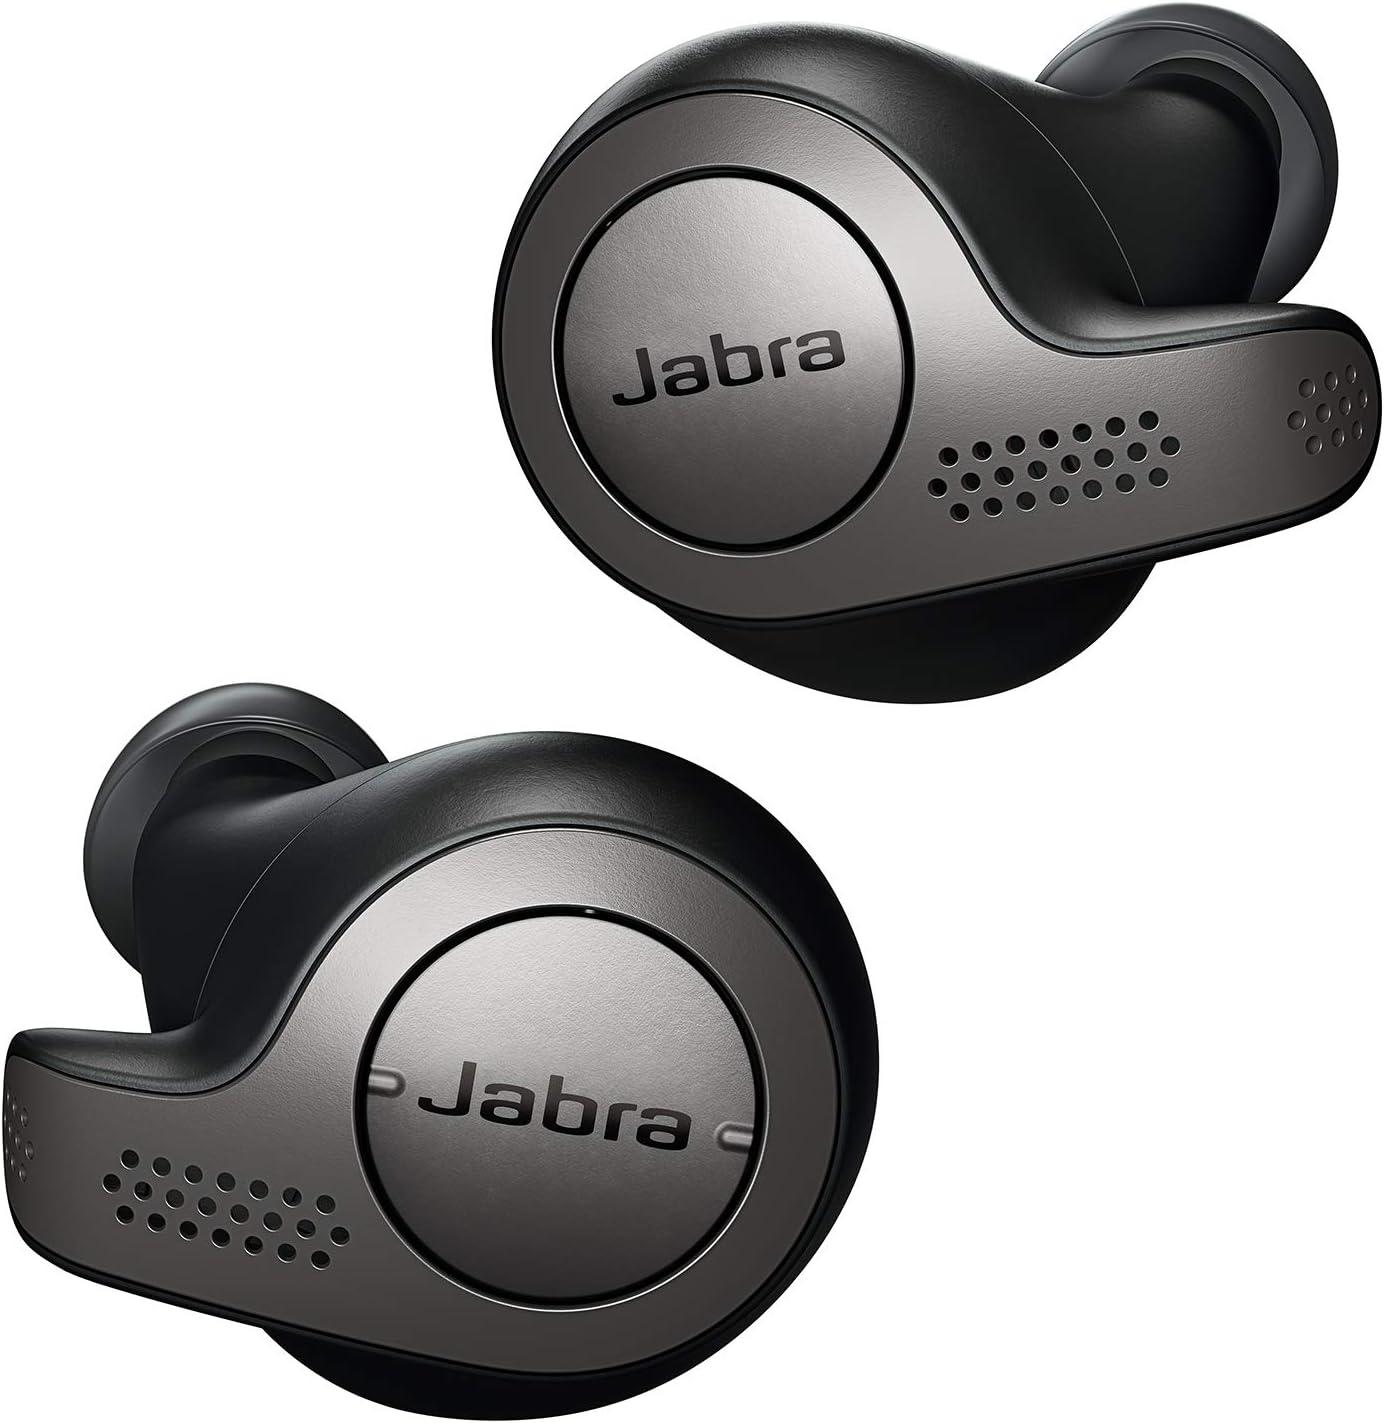 Jabra Elite 65t Alexa Enabled True Wireless Earbuds with Charging Case - Titanium Black (Renewed)